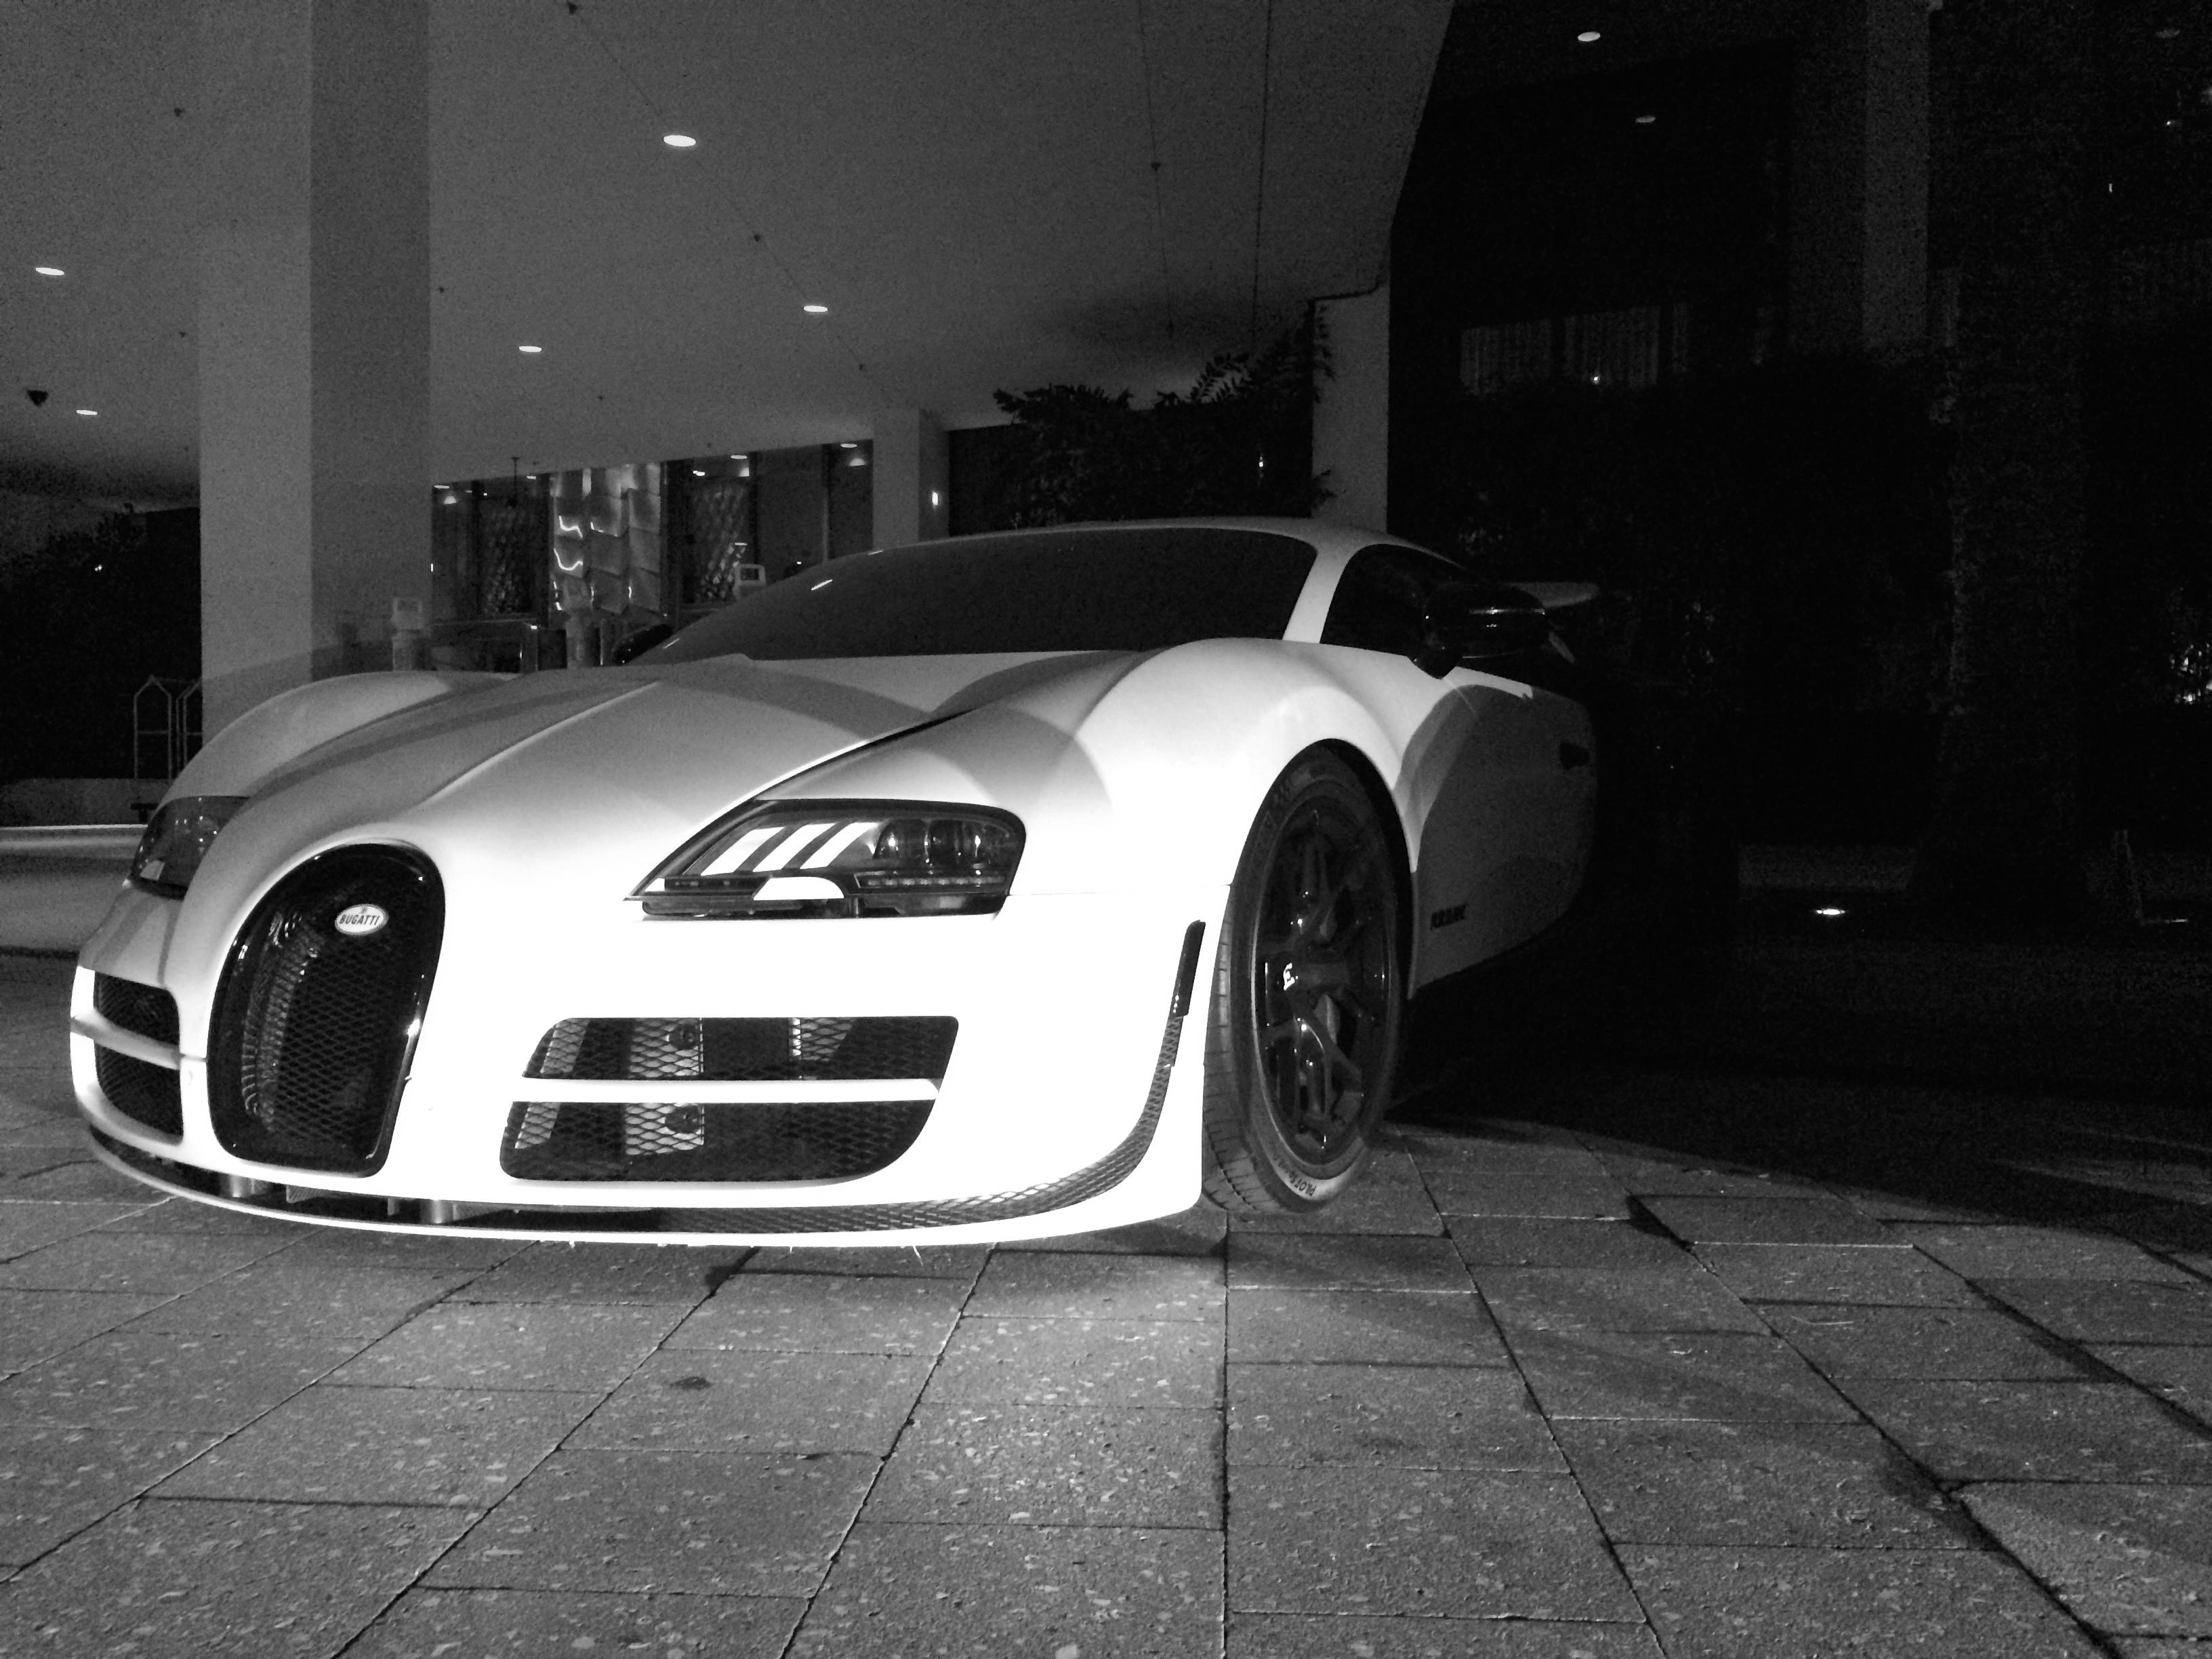 img_3997-2-54879796b1bb4 Stunning Bugatti Veyron Super Sport White Cars Trend